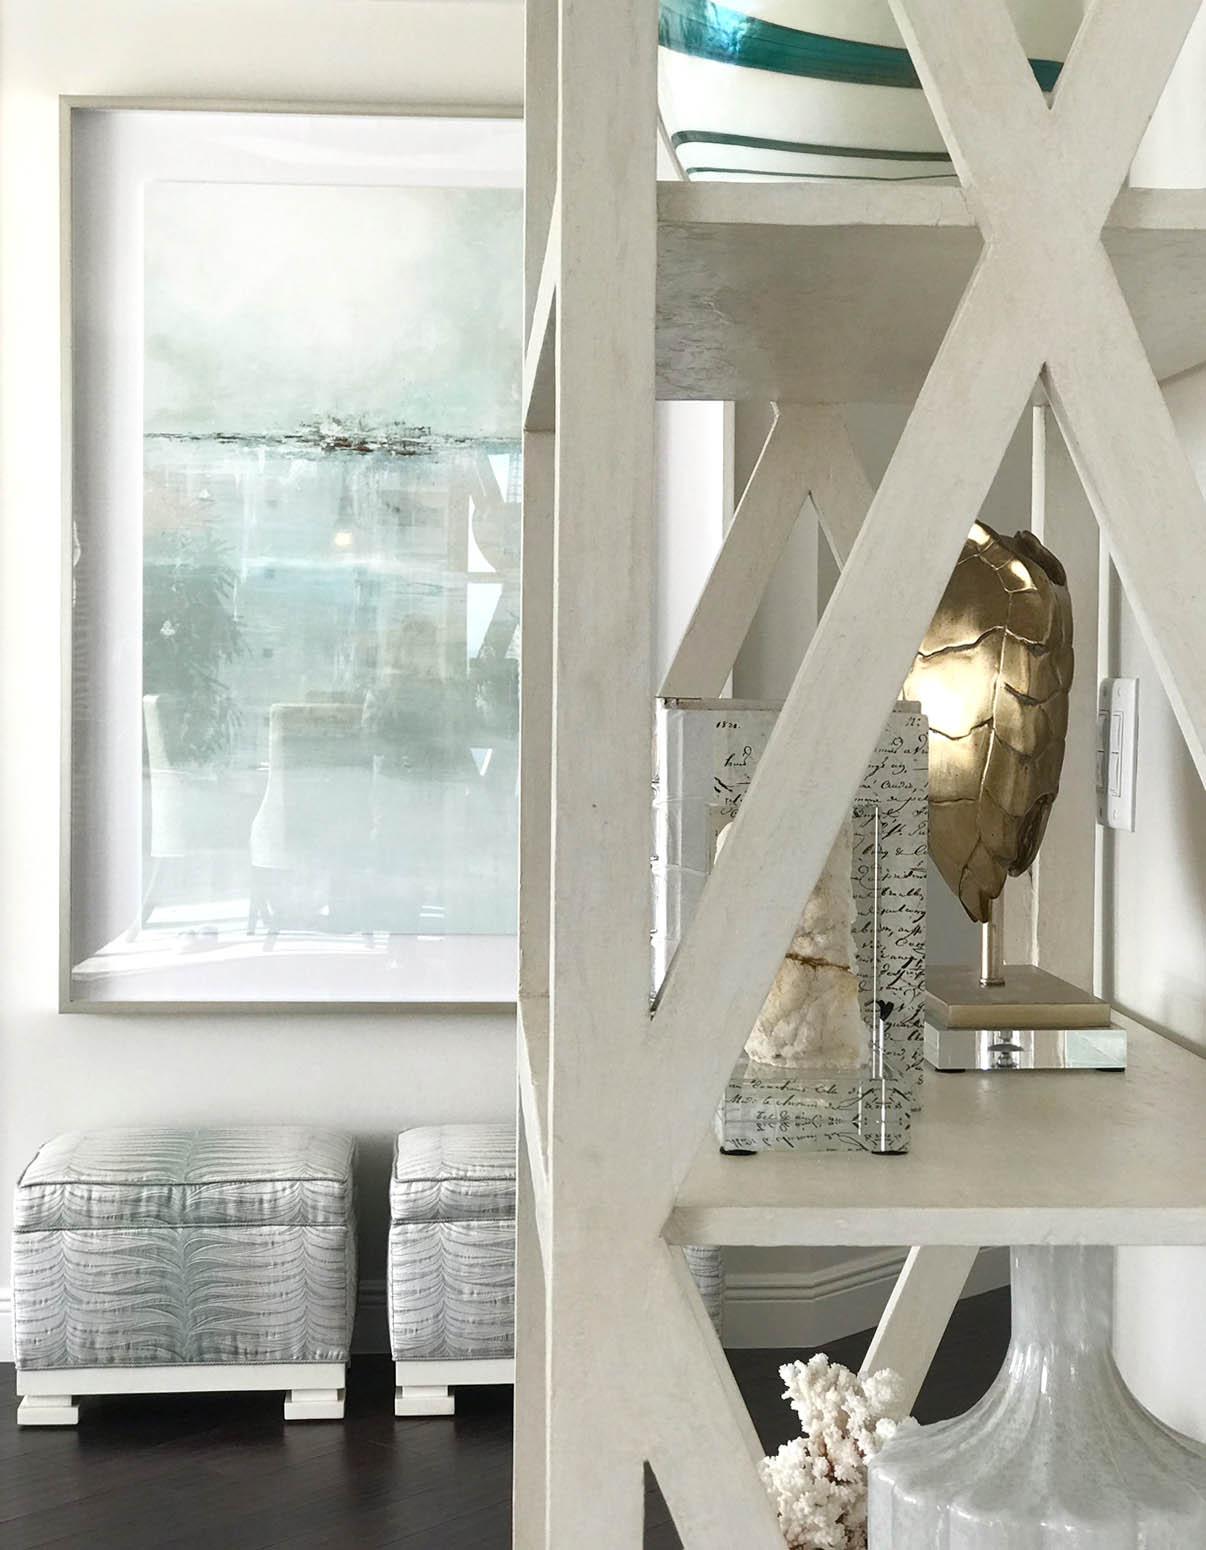 Interior Design by Danielle Reardon